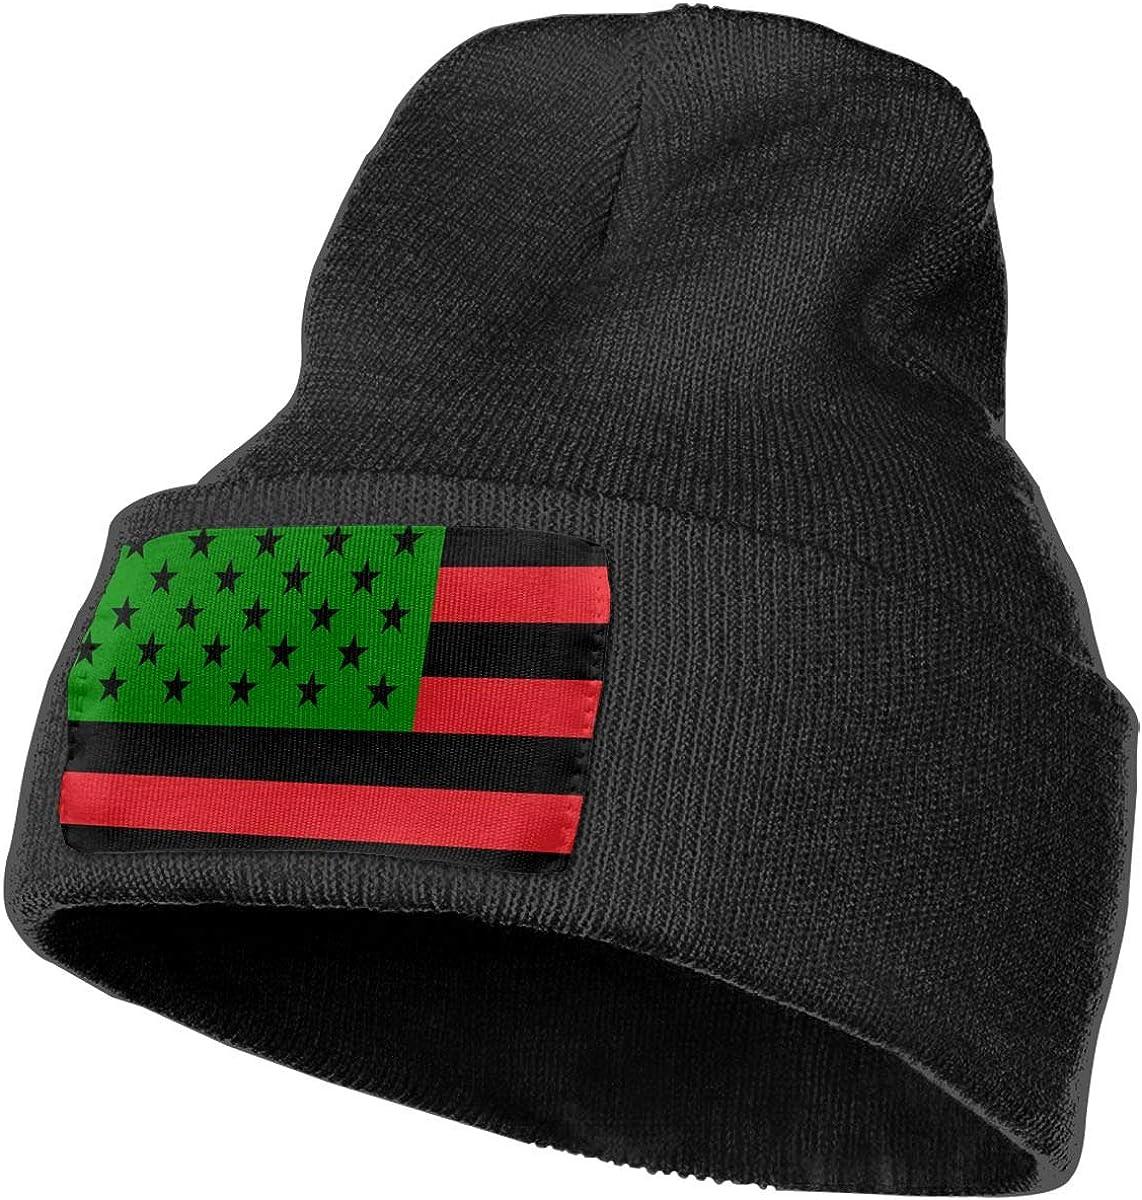 Ruin Black American Flag Fashion Knitting Hat for Men Women 100/% Acrylic Acid Mas Beanie Hat